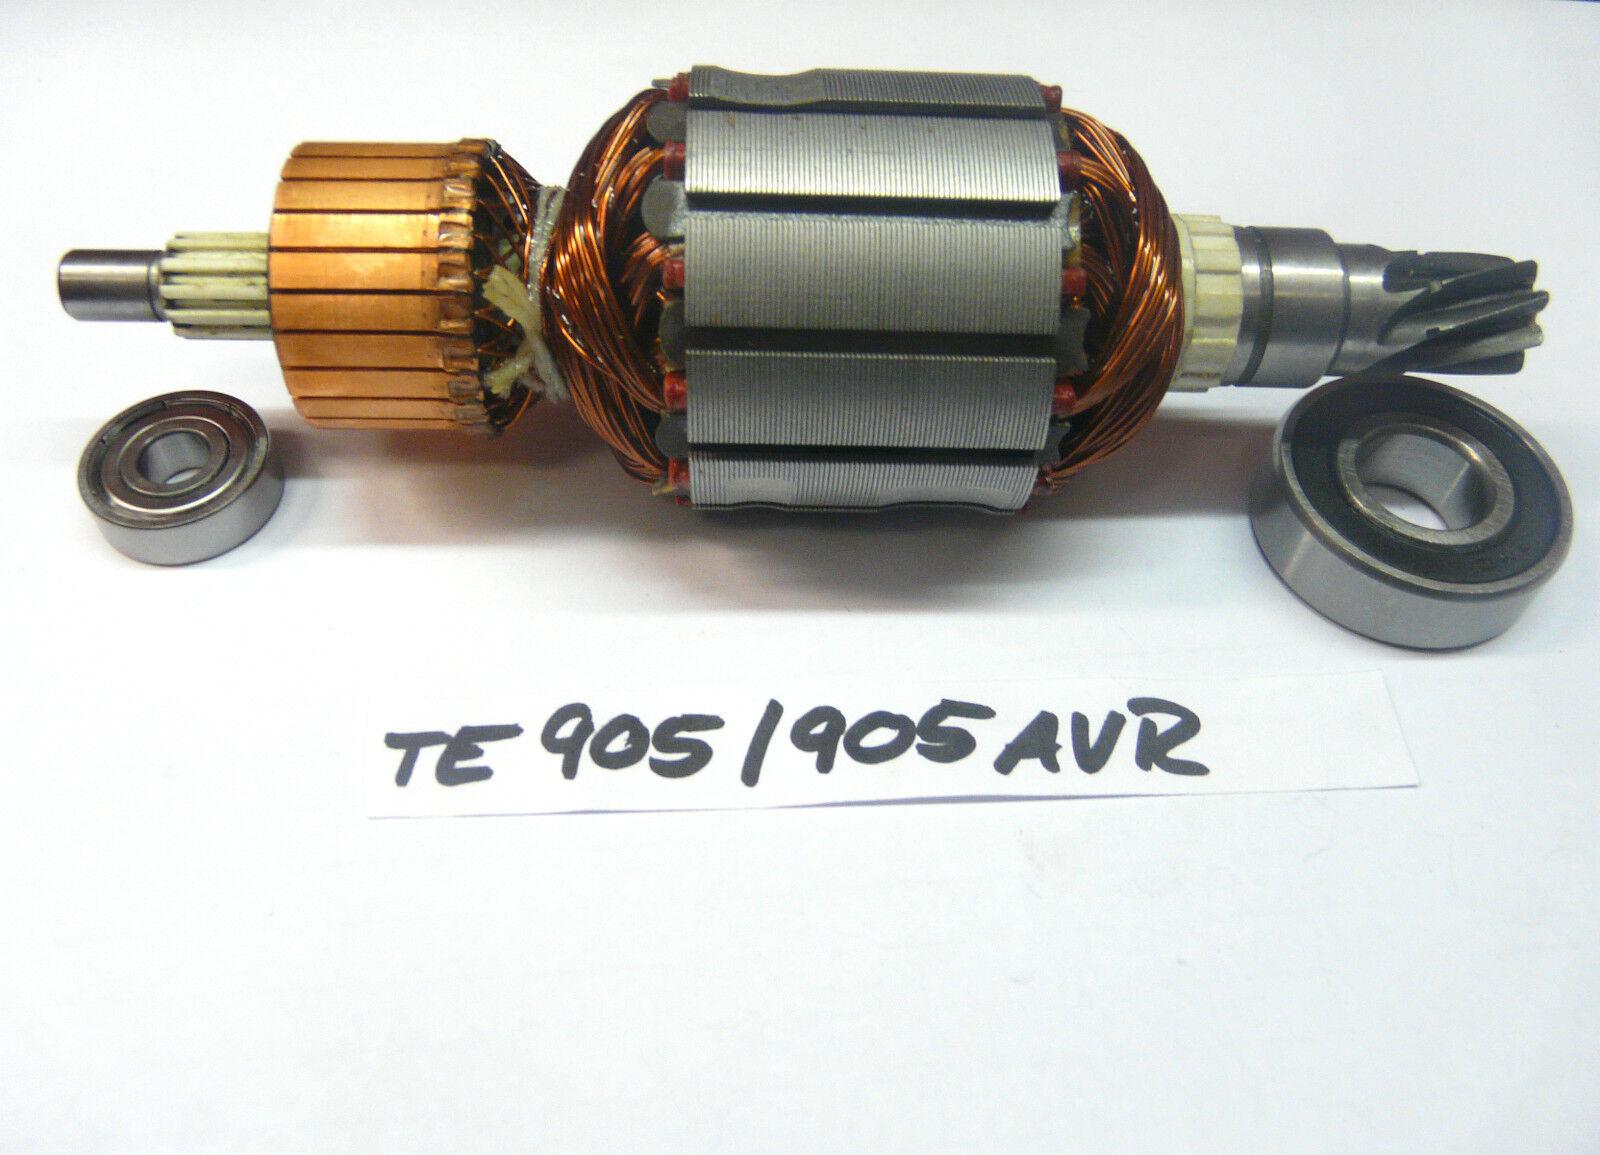 Hilti TE 905, TE 905 AVR Rotor mit beiden Lagern    NEU